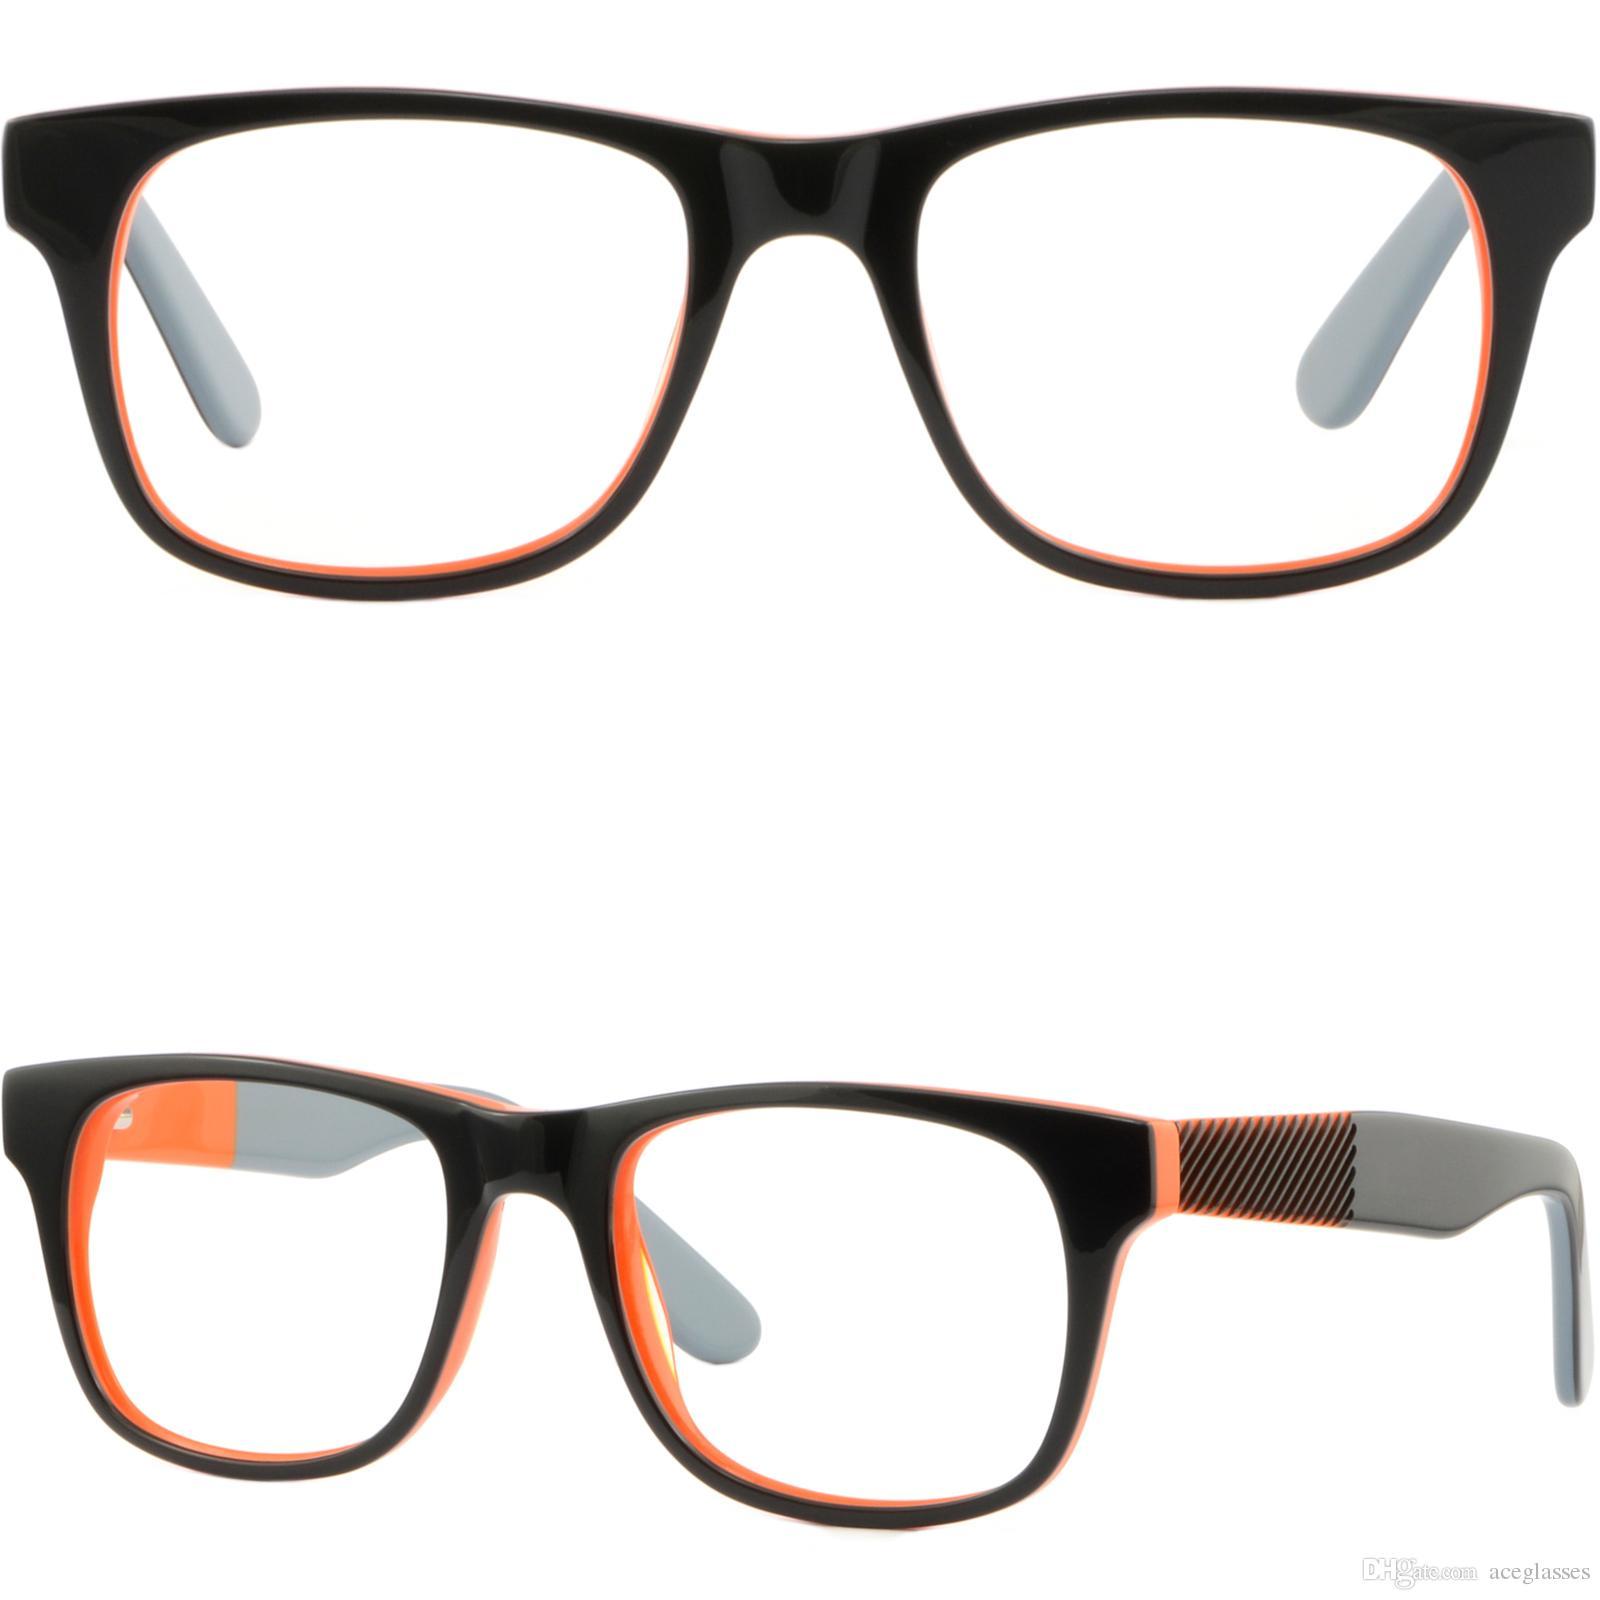 Cornici per occhiali da vista rettangolari in plastica nera 5eq3dAWujd